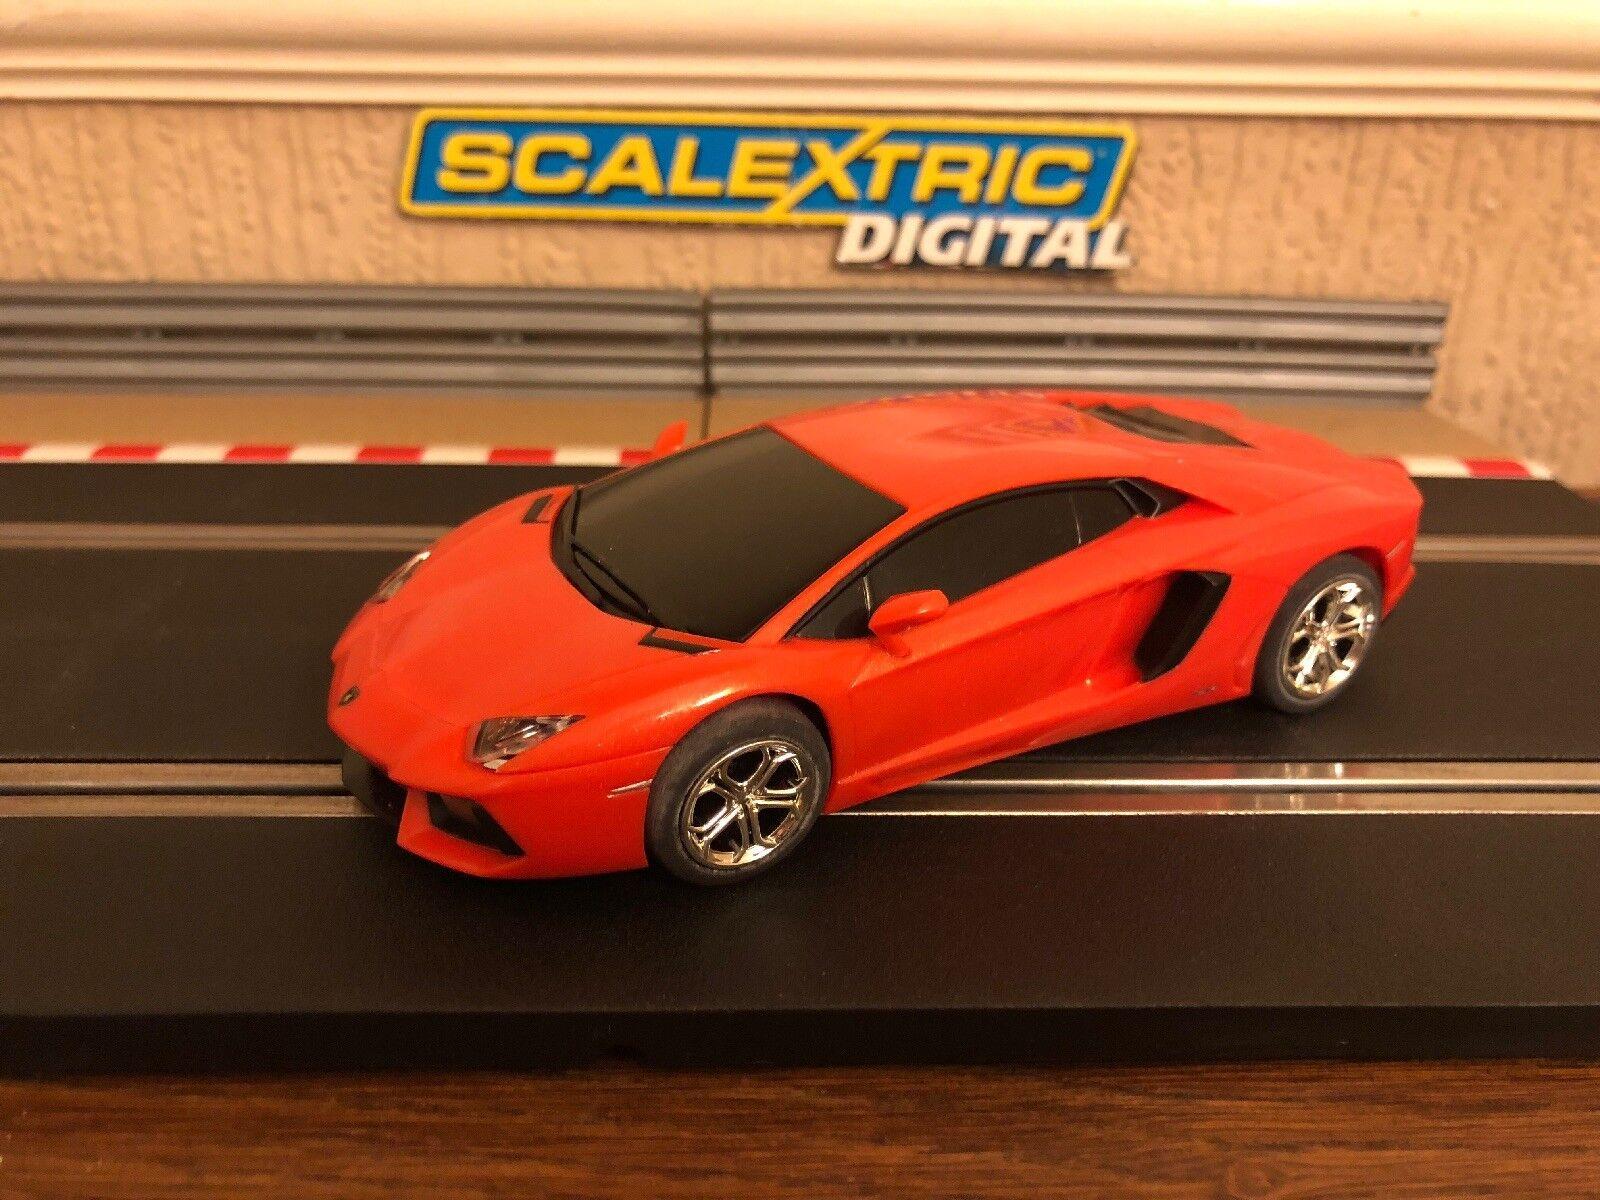 Scalextric Digital LAMBORGHINI AVENTADOR LP 700-4 borrealis Arancione C3460 Nuovo di zecca